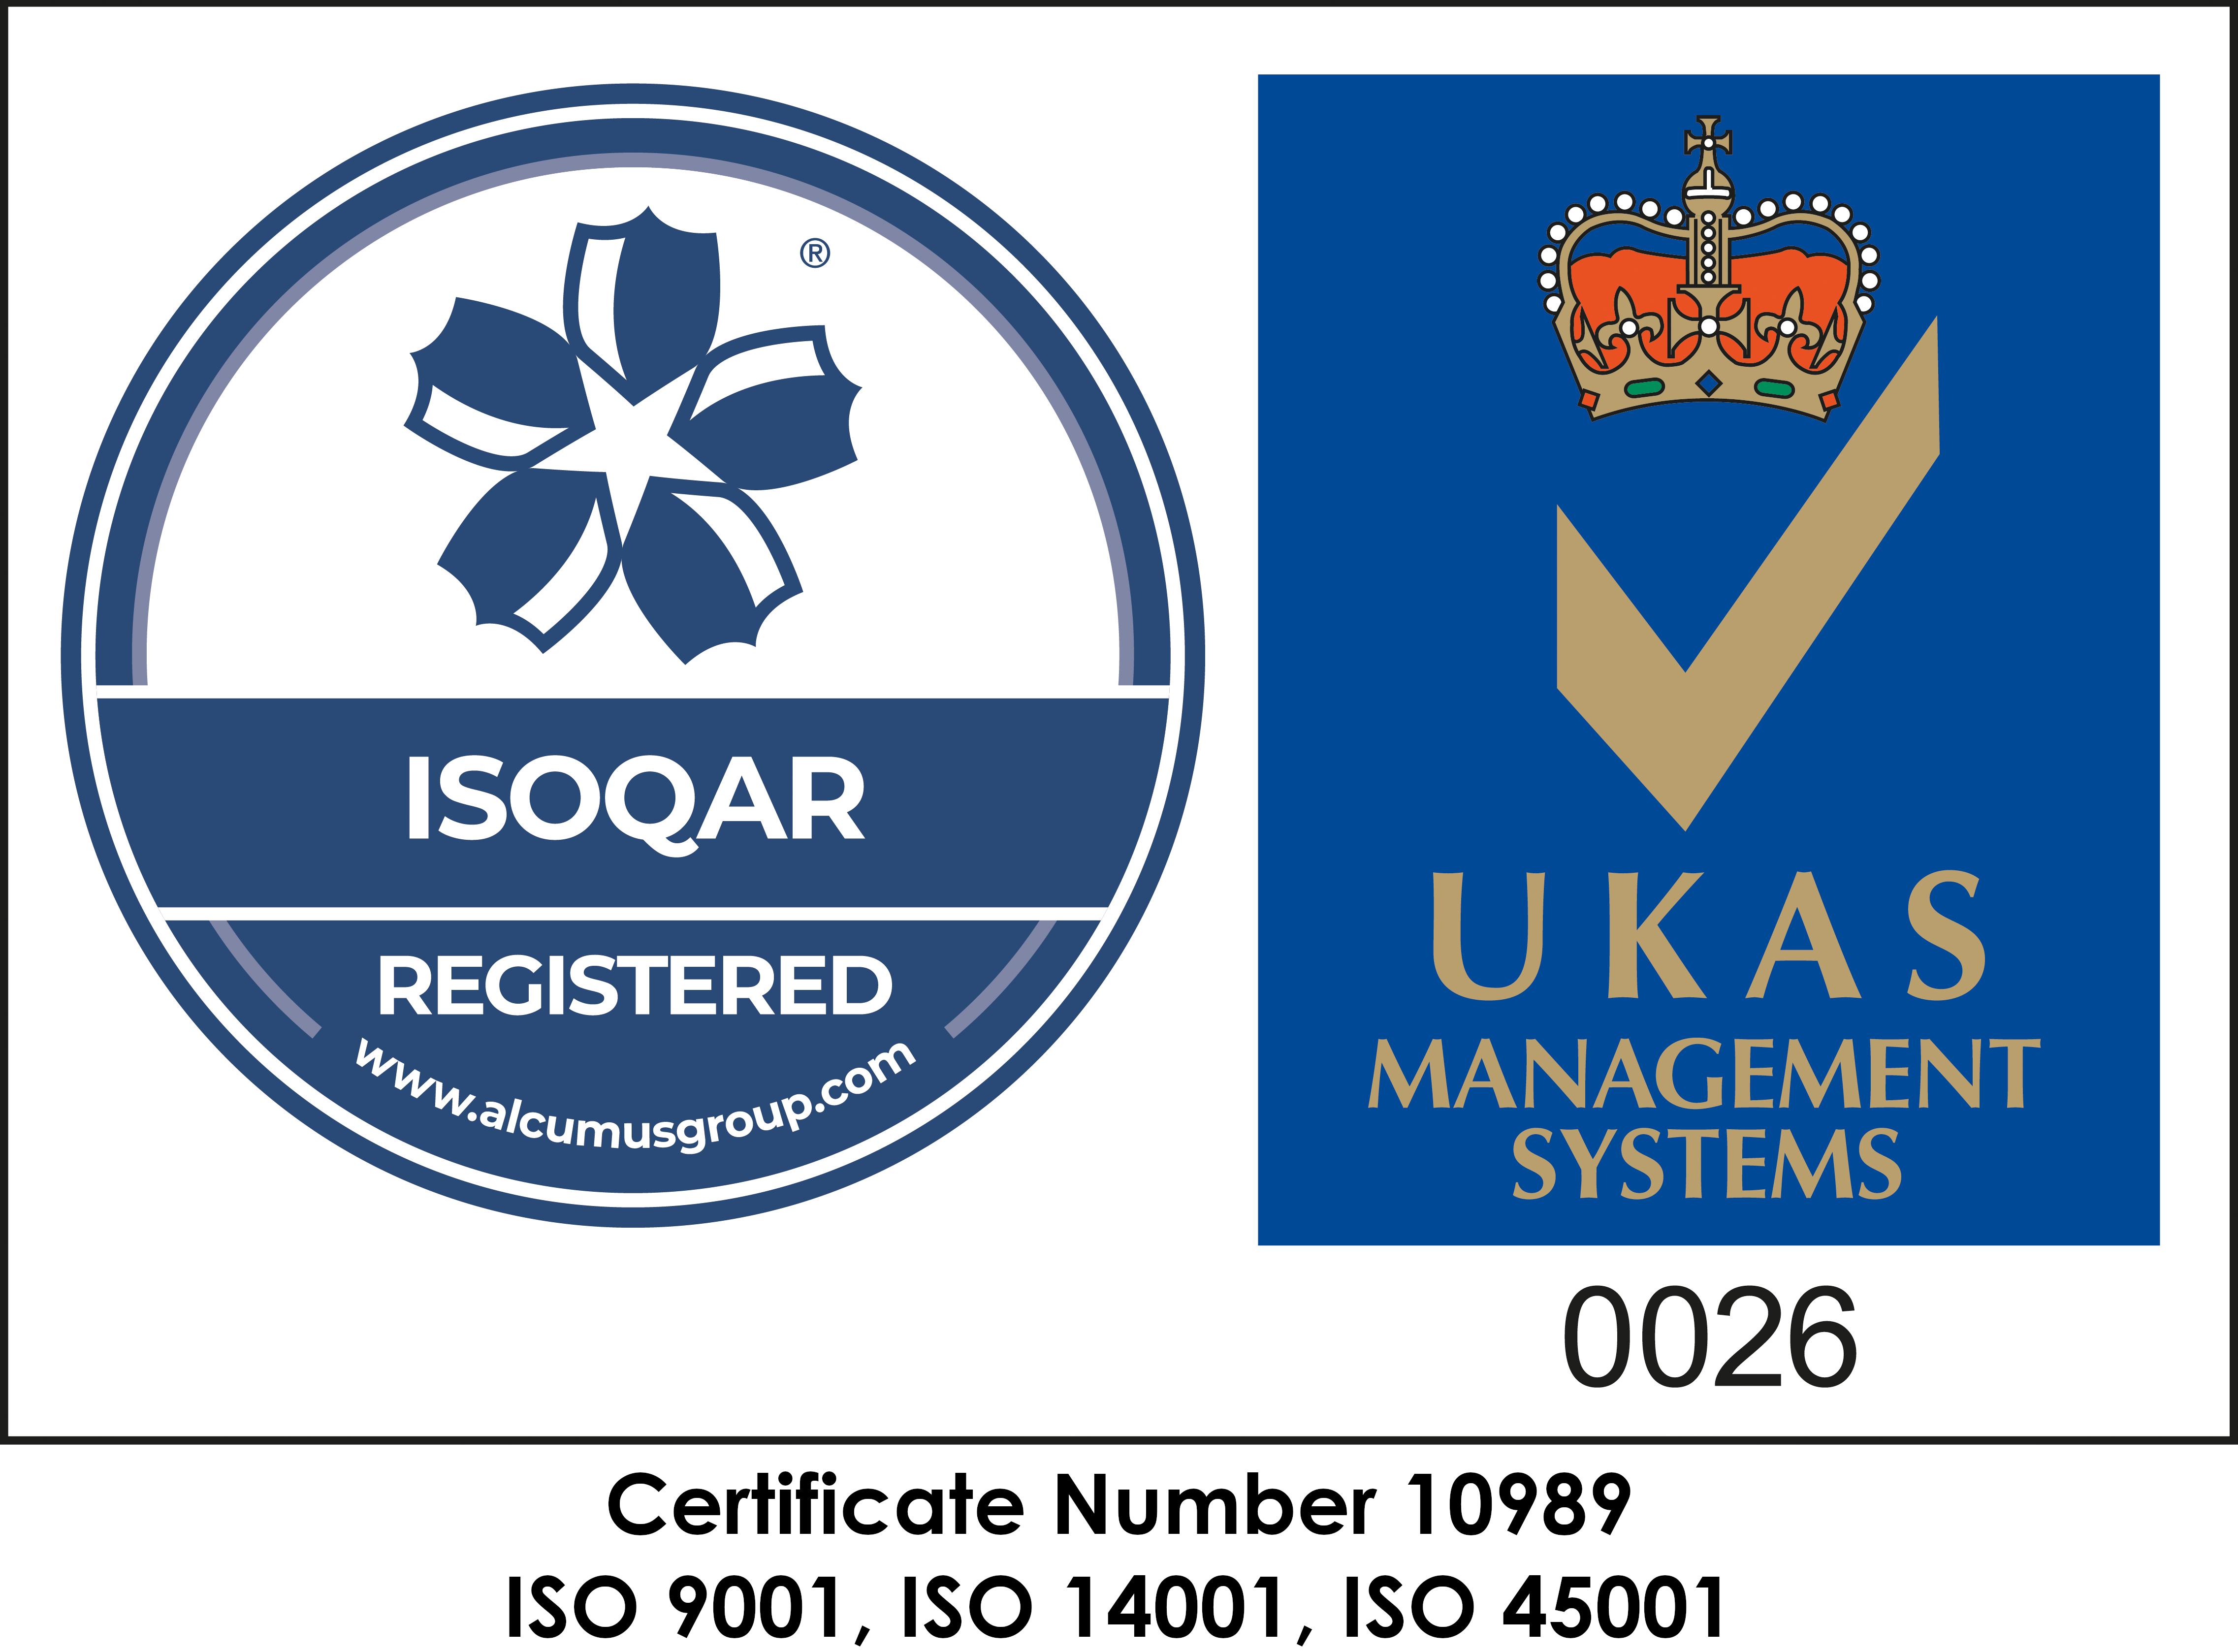 Wiser's ISOQAR Management System Logo